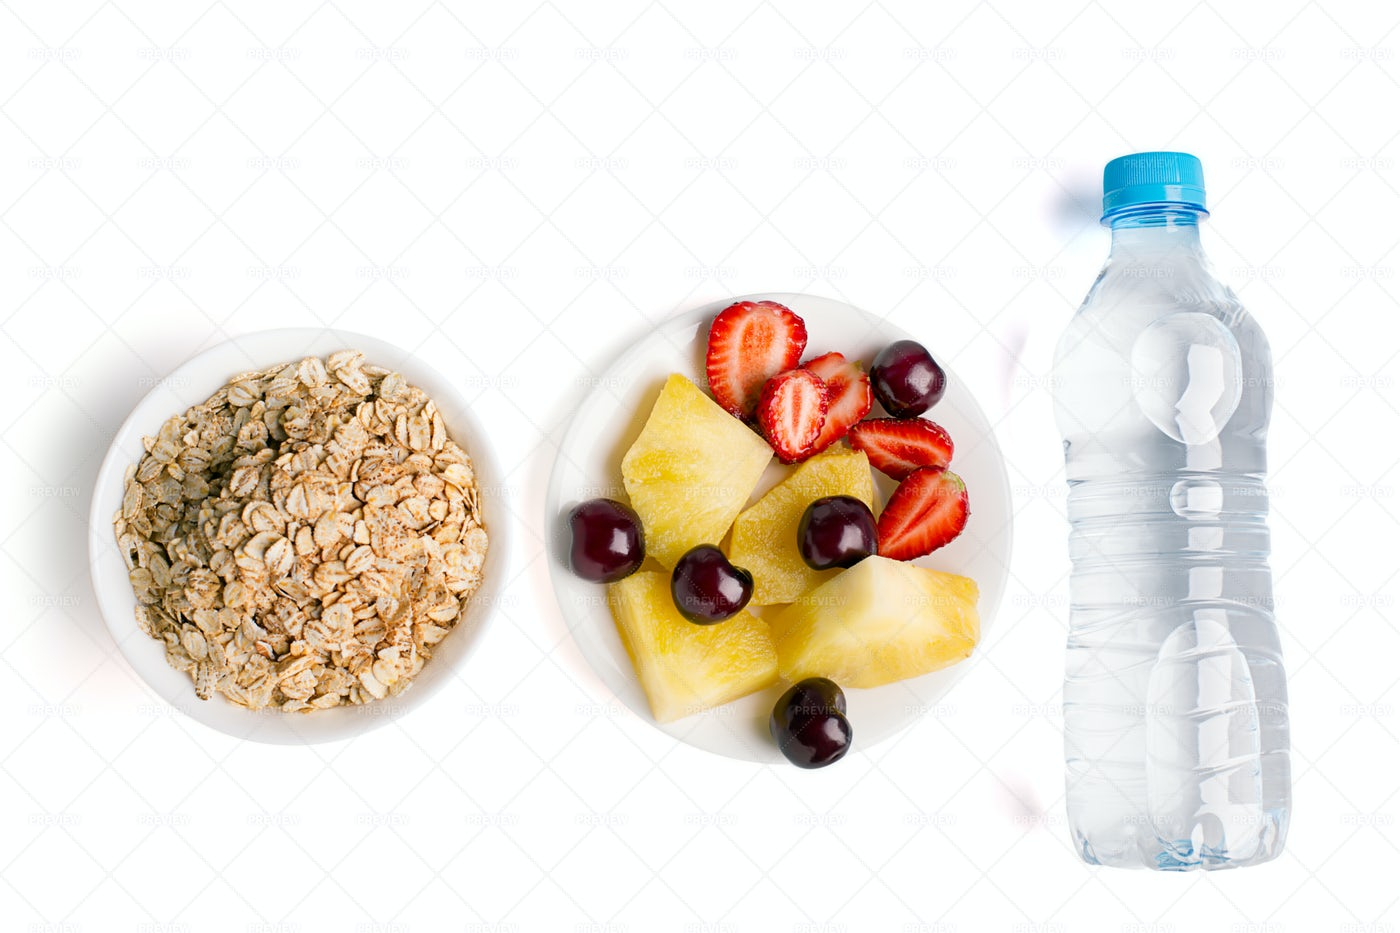 Dieting Breakfast: Stock Photos